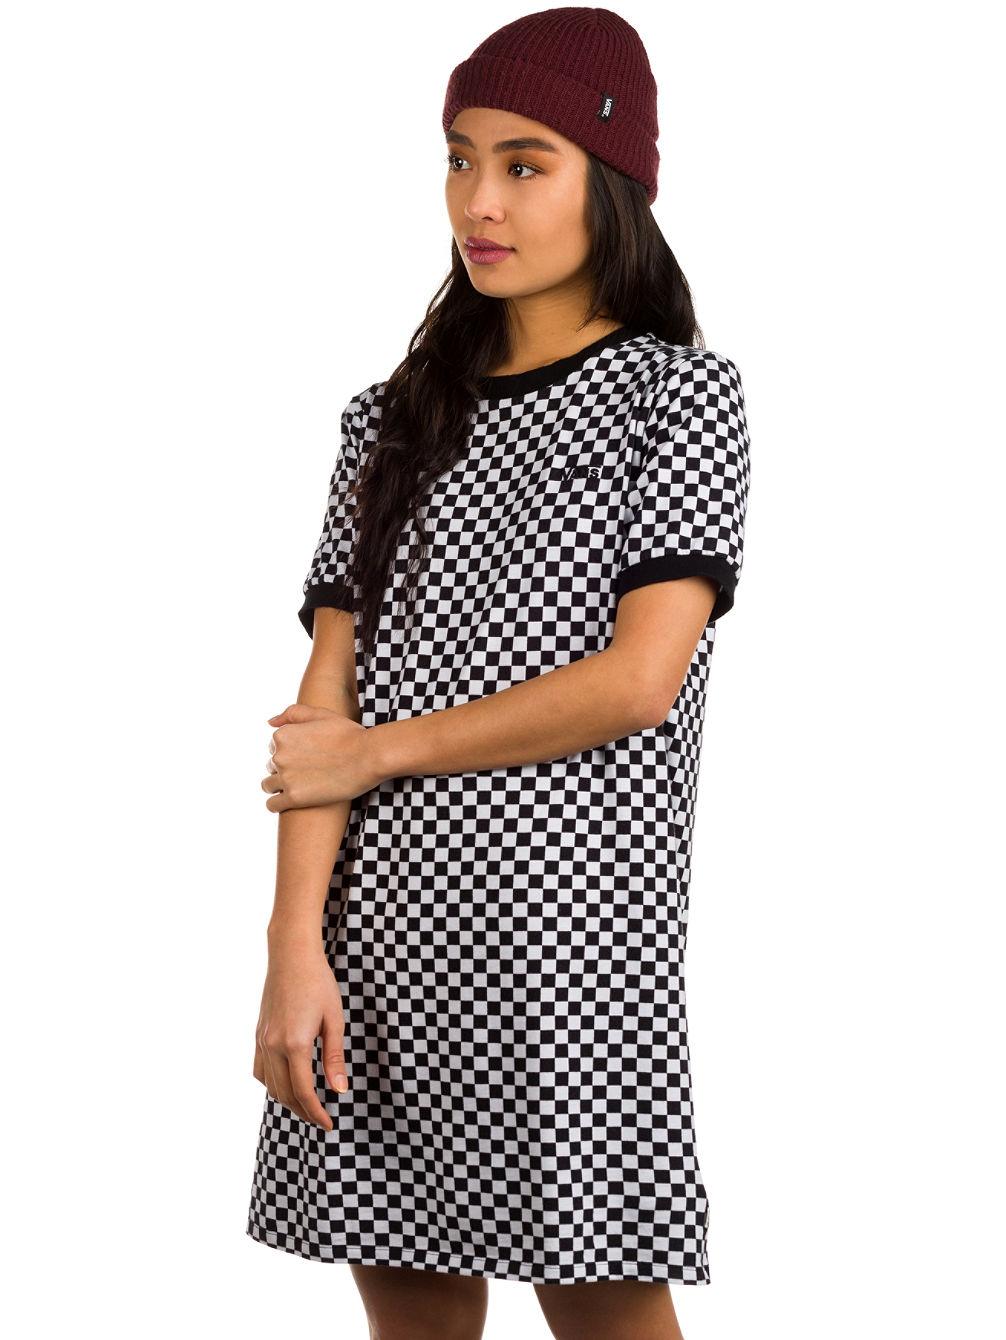 f44c9f7cd3 Buy Vans Checkerboard High Roller Print Dress online at Blue Tomato